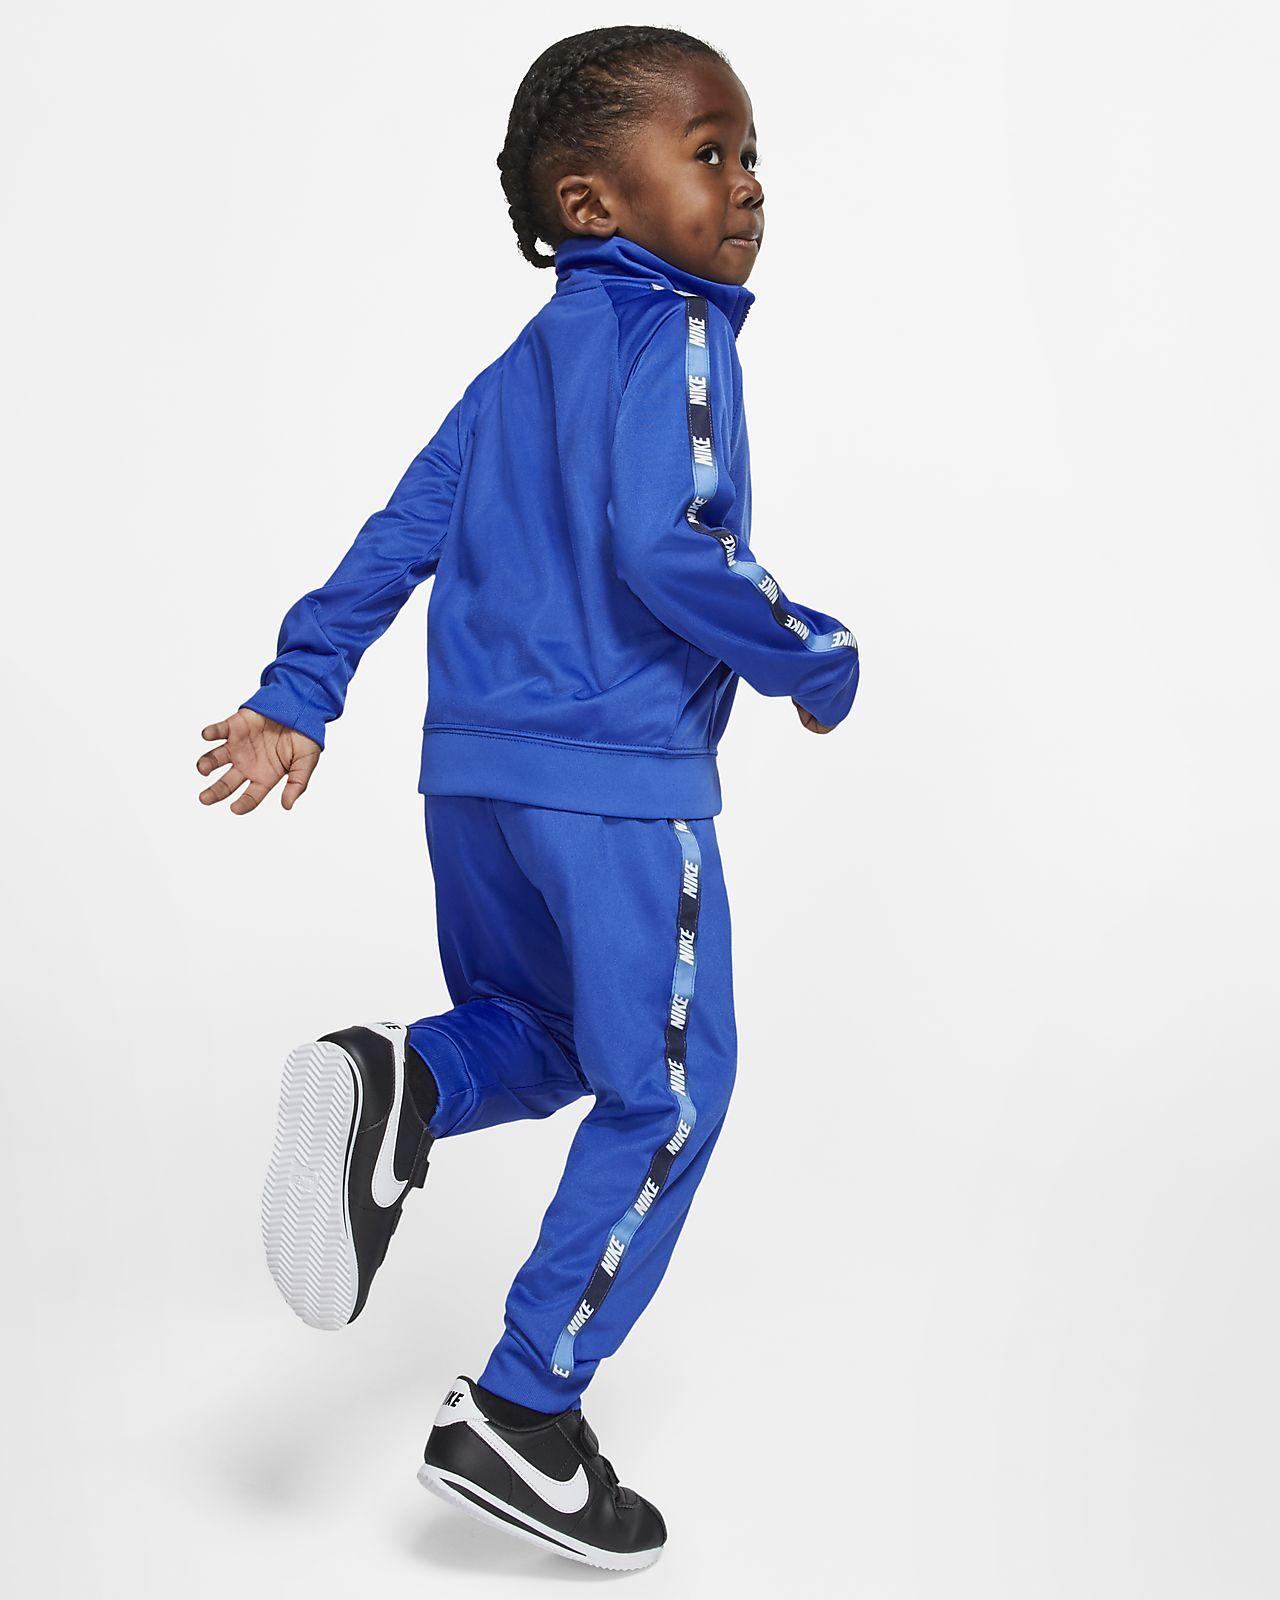 Nike Sportswear Tricot Tracksuit Trainingsanzug Kinder